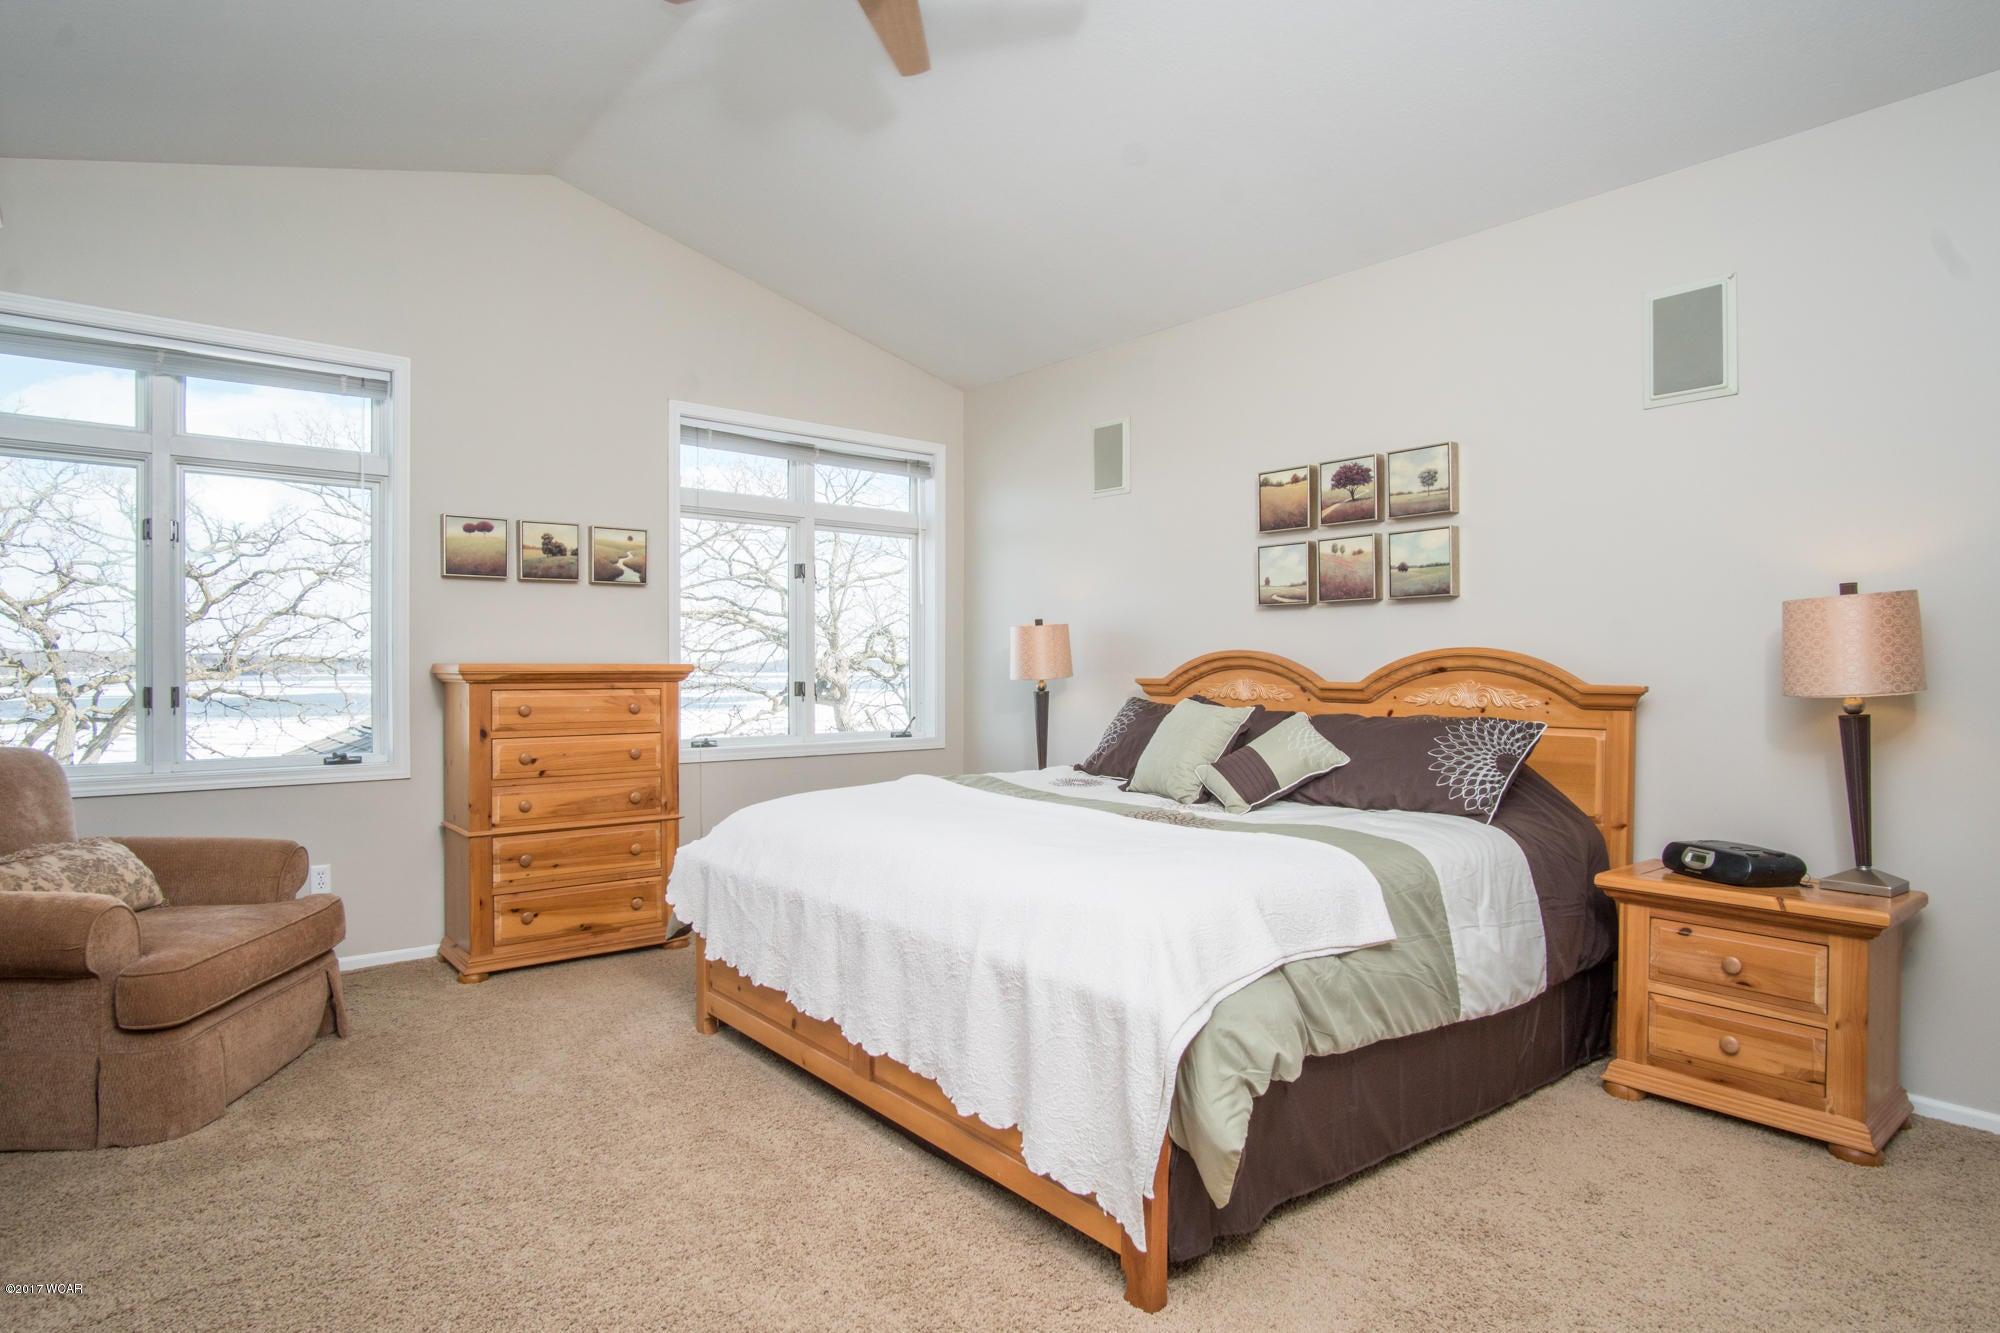 1120 S Andrew Drive,New London,4 Bedrooms Bedrooms,4 BathroomsBathrooms,Single Family,S Andrew Drive,6026076